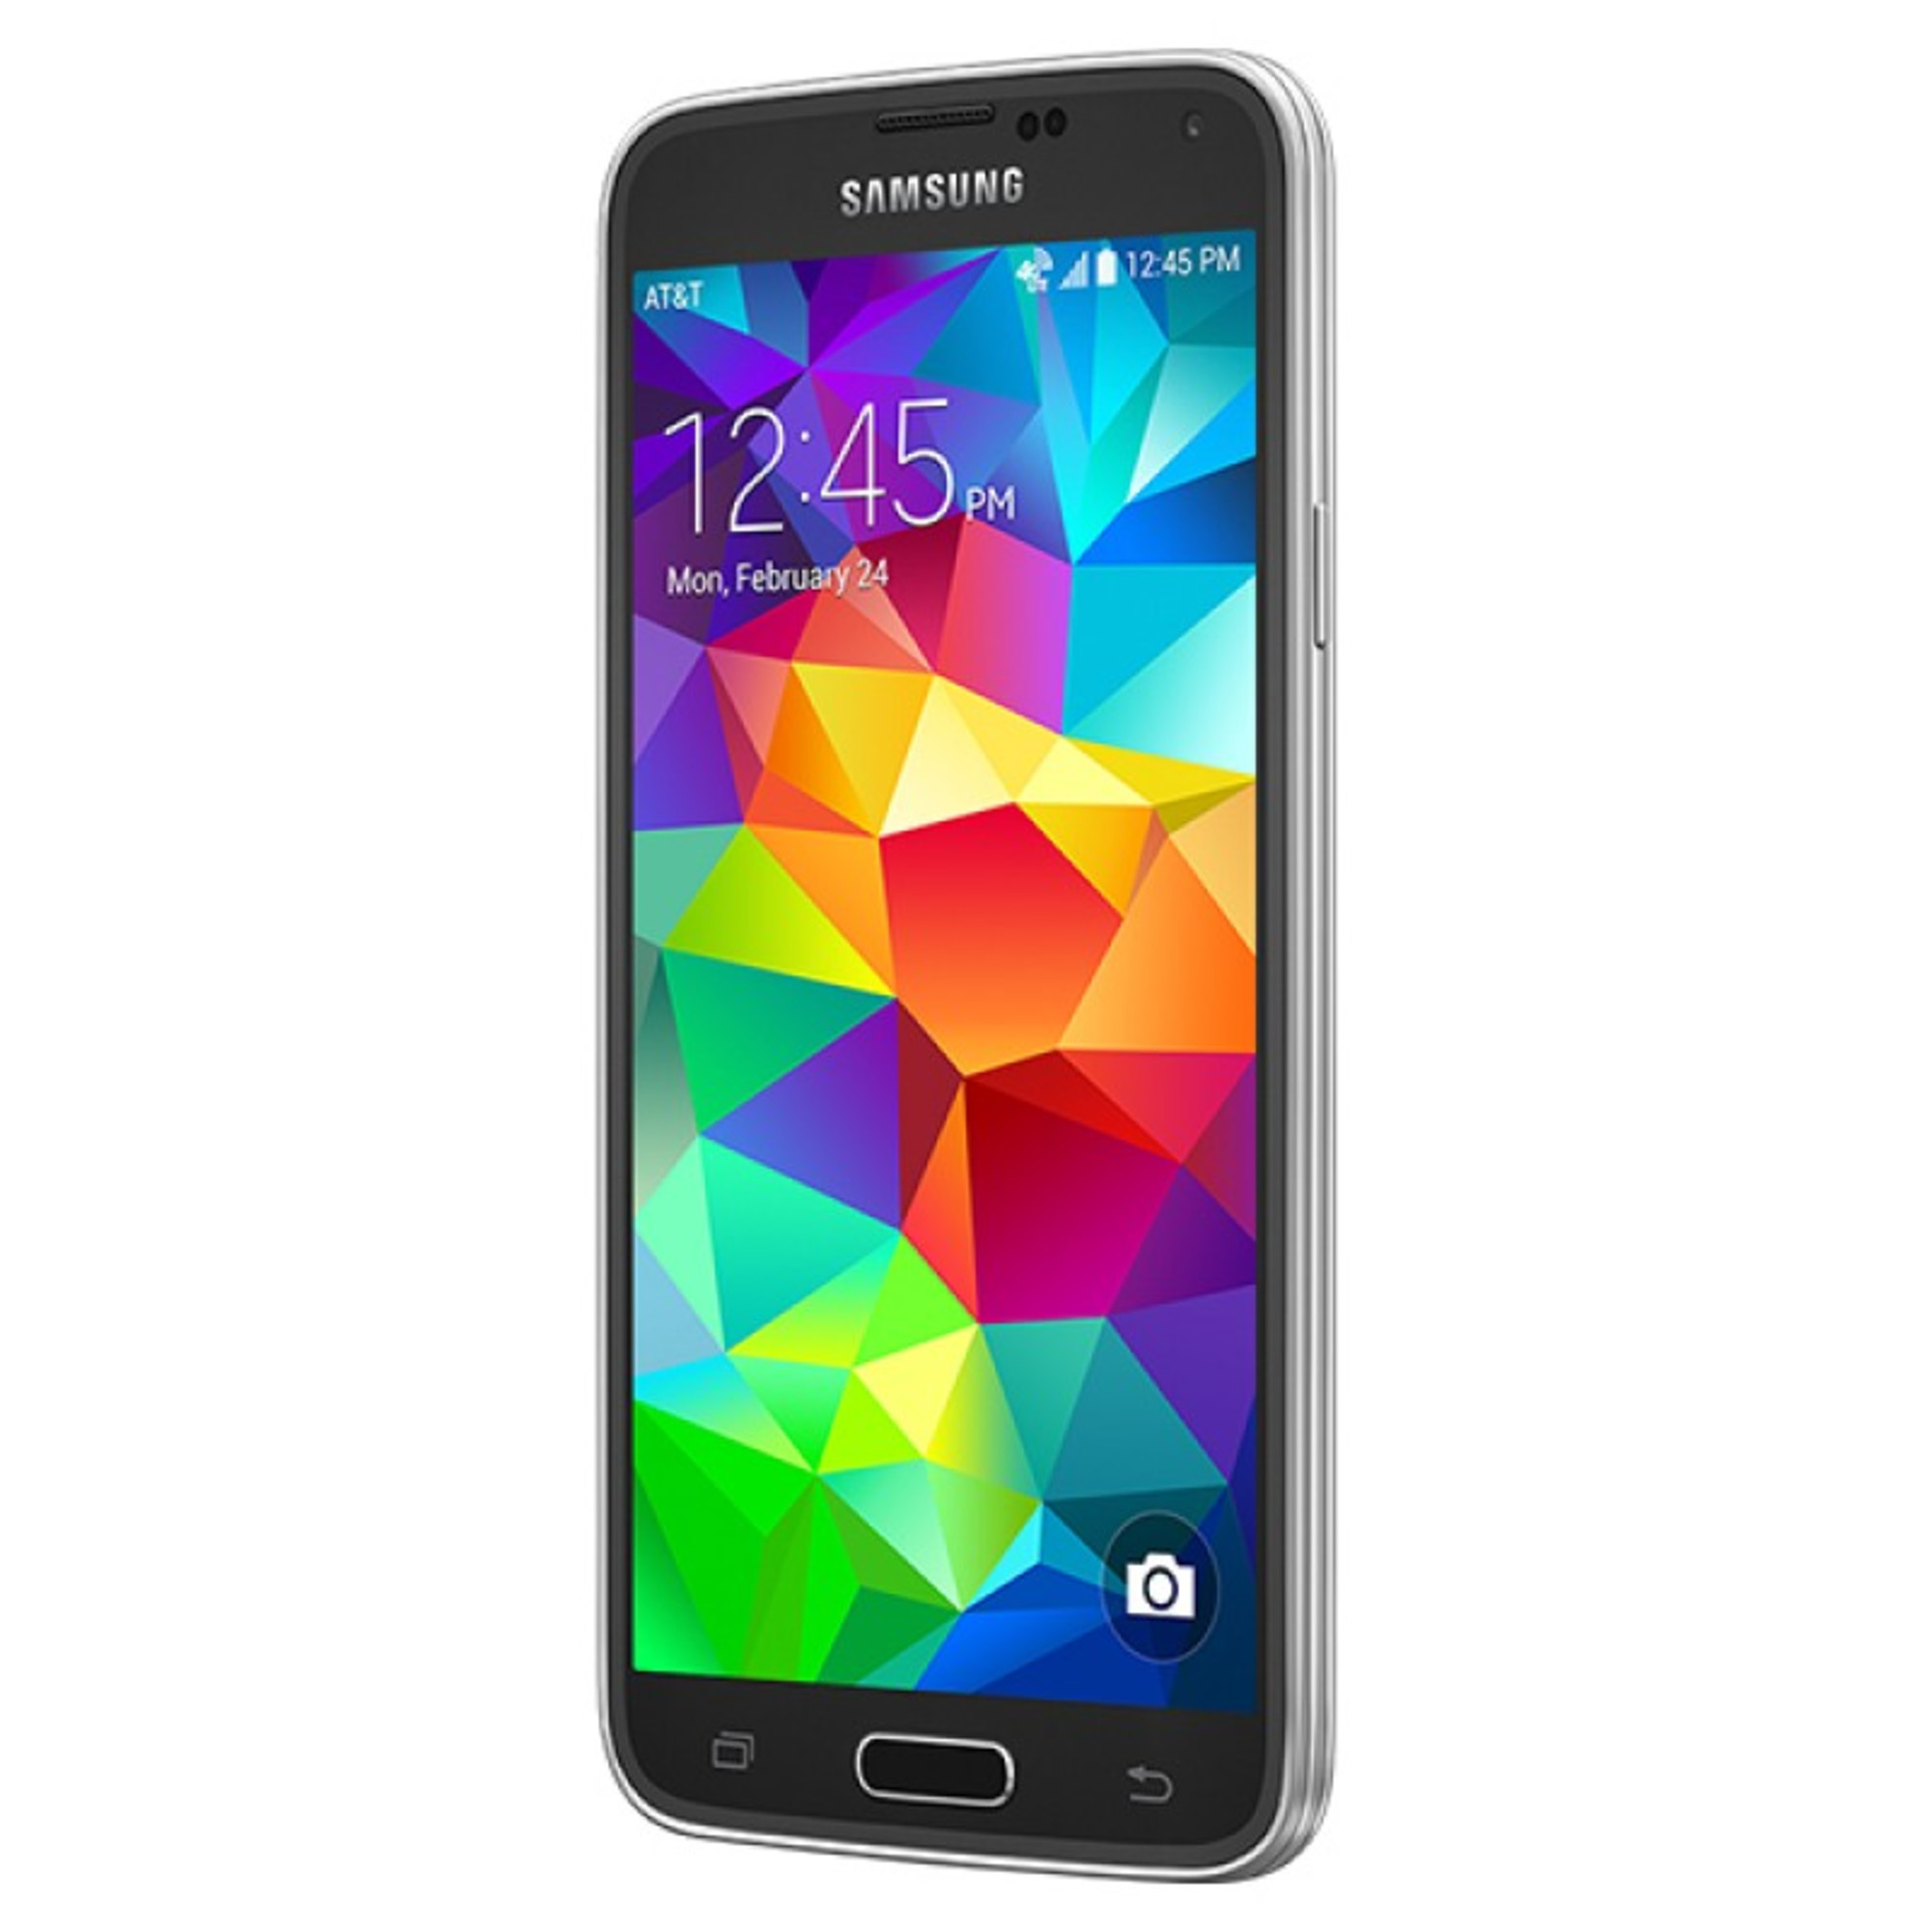 samsung galaxy s5 16gb verizon cdma 4g lte 16mp phone. Black Bedroom Furniture Sets. Home Design Ideas